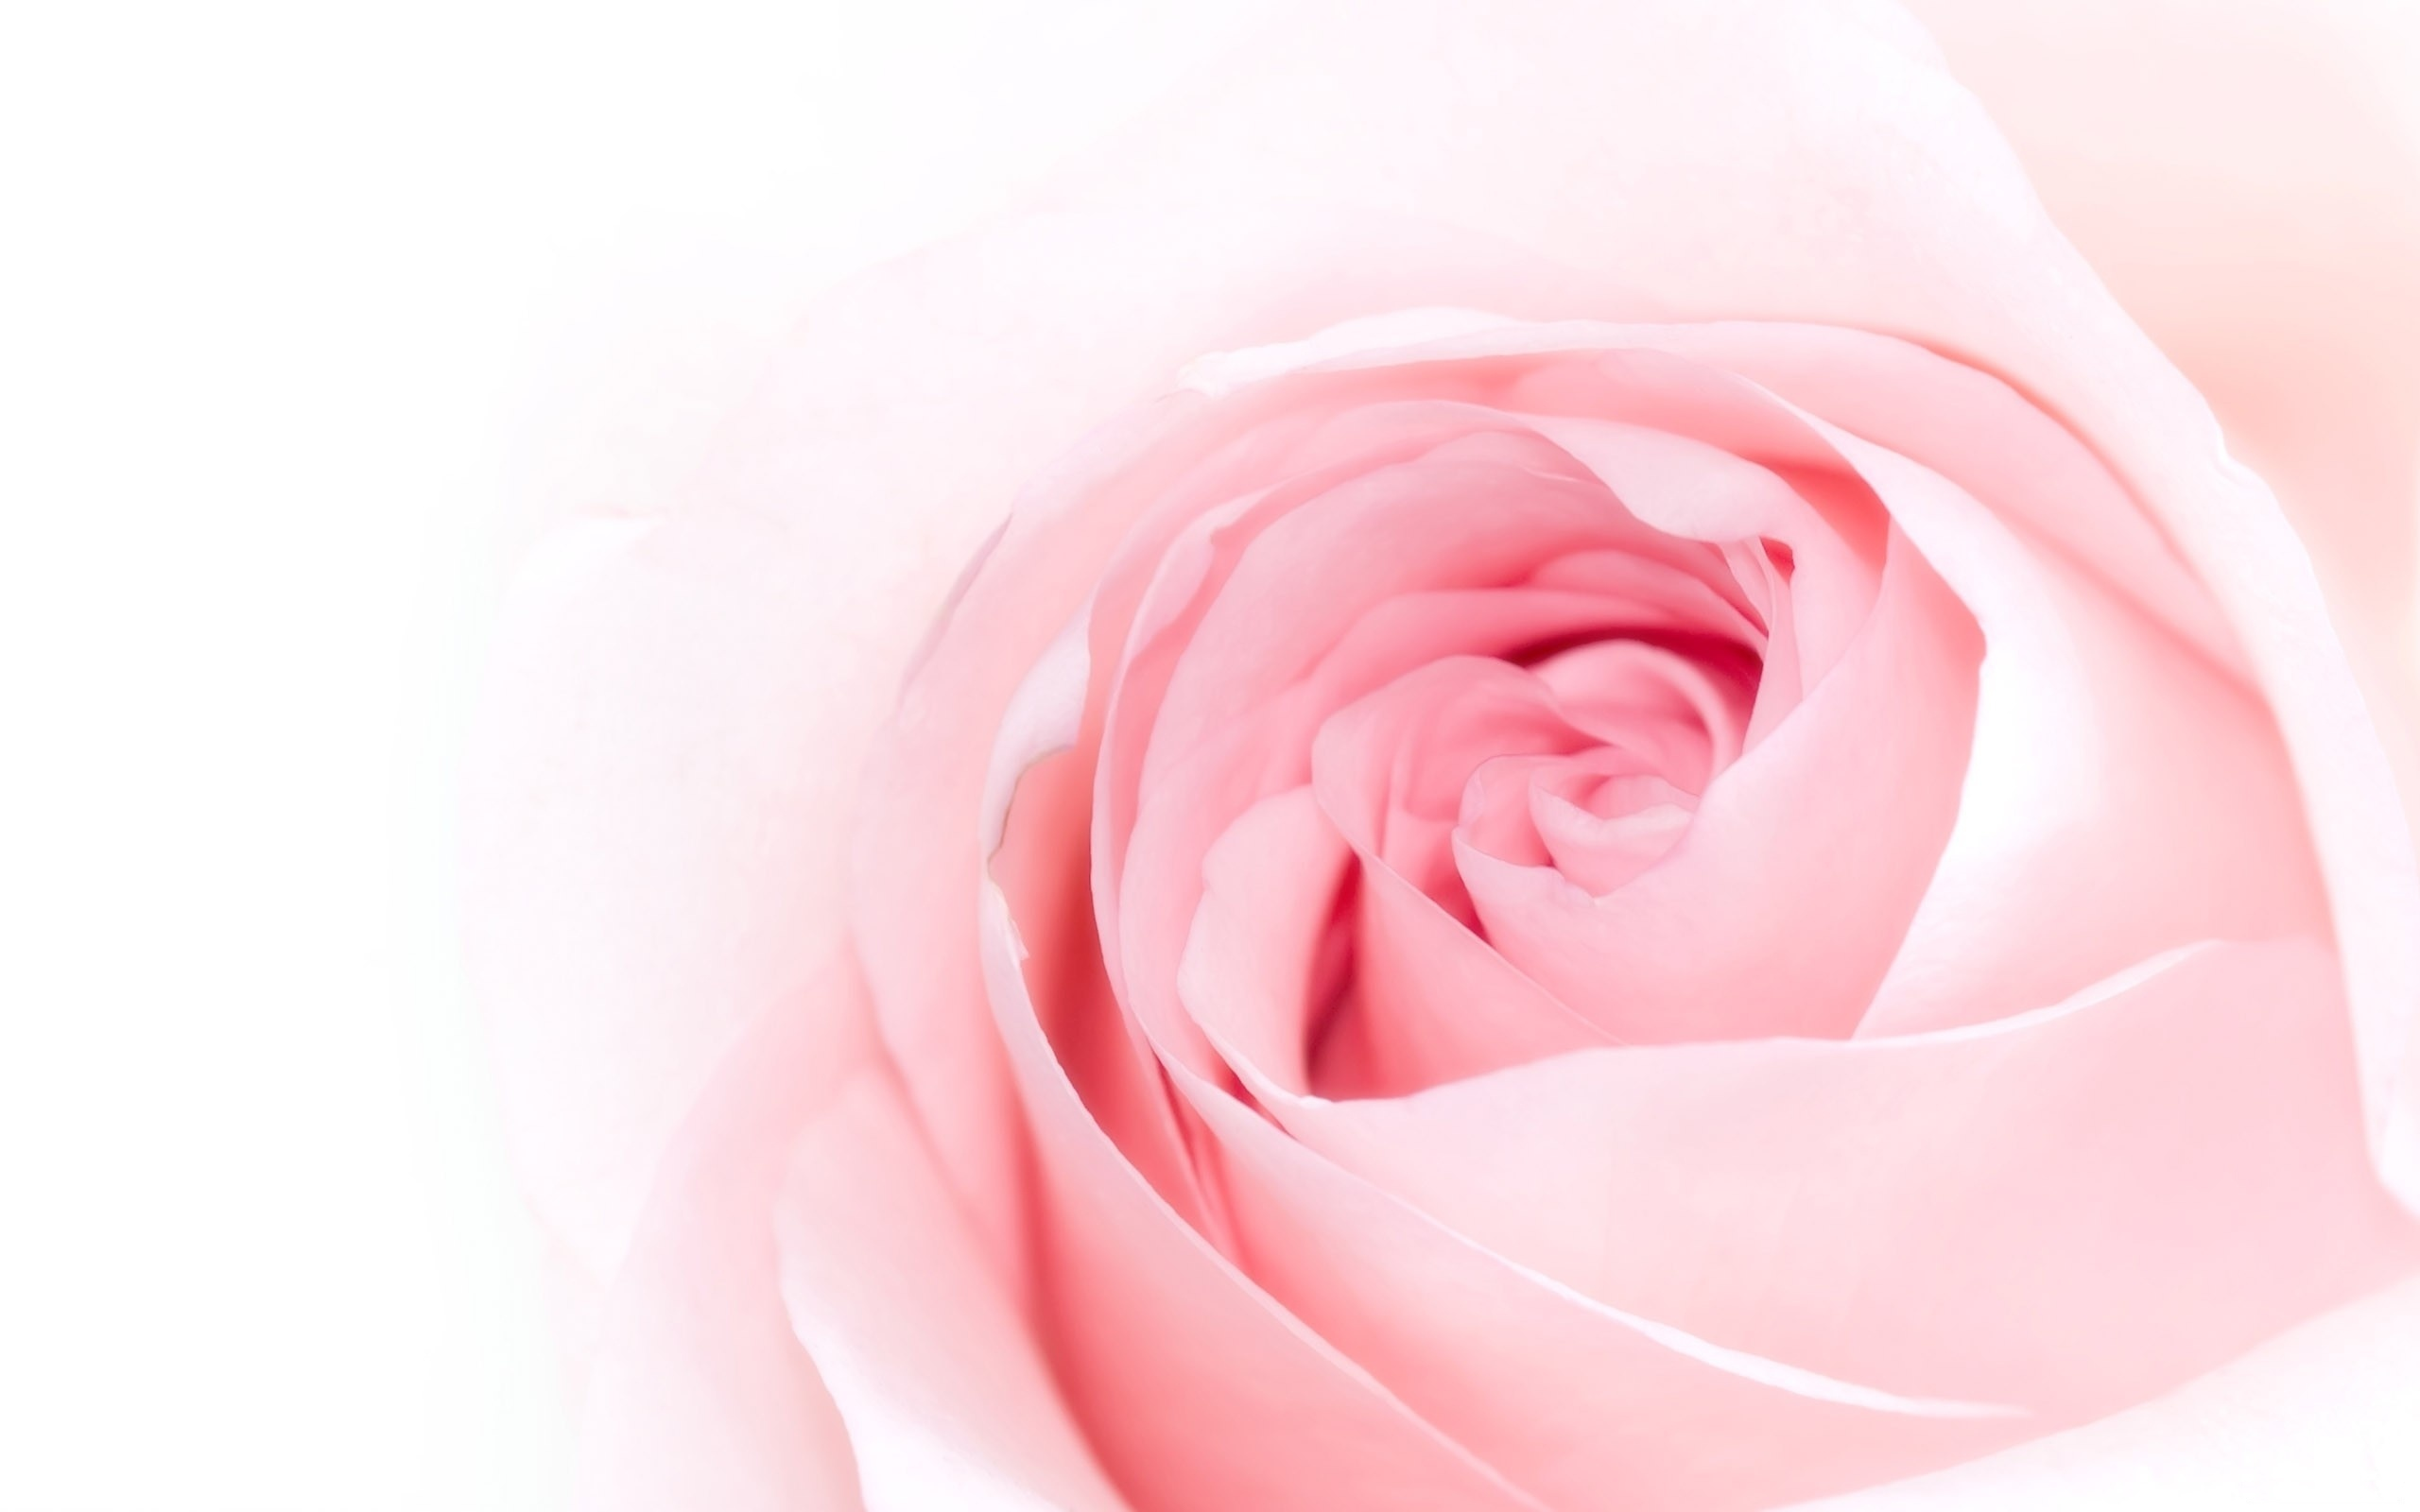 rose flower petals 25893